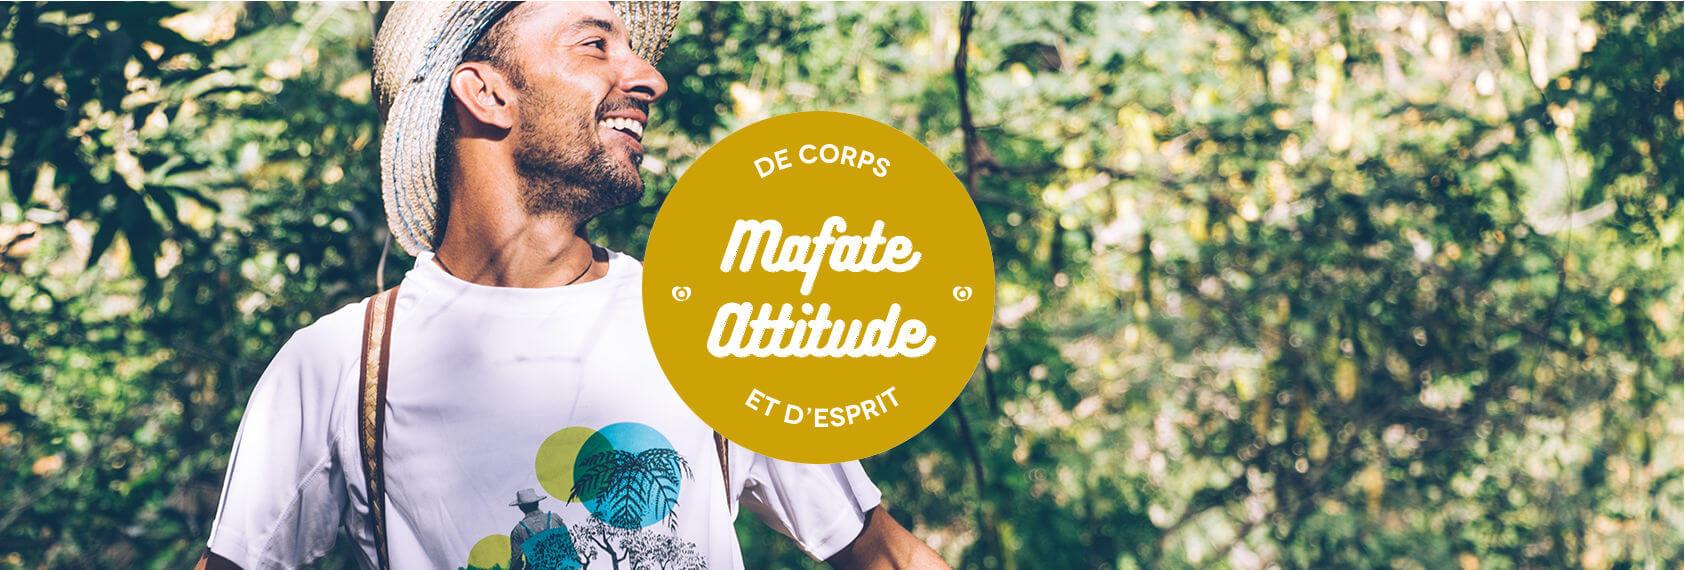 Notre gamme de produits exclusifs - Mafate attitude